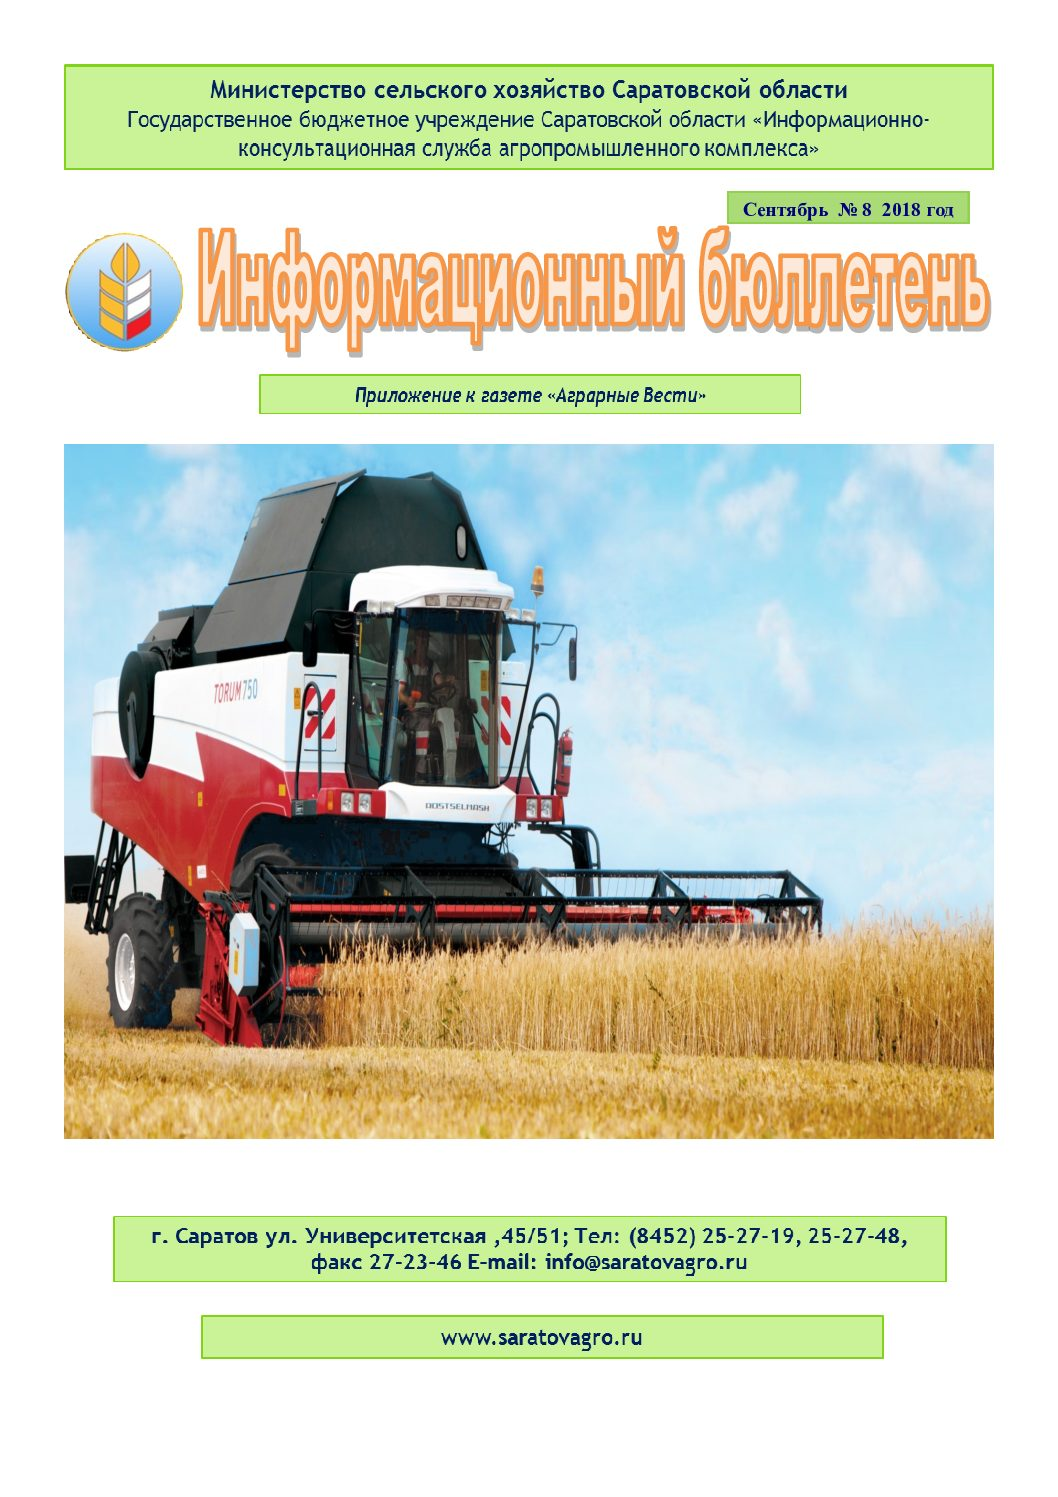 https://saratovagro.ru/wp-content/uploads/2020/08/8.2018-1-pdf.jpg